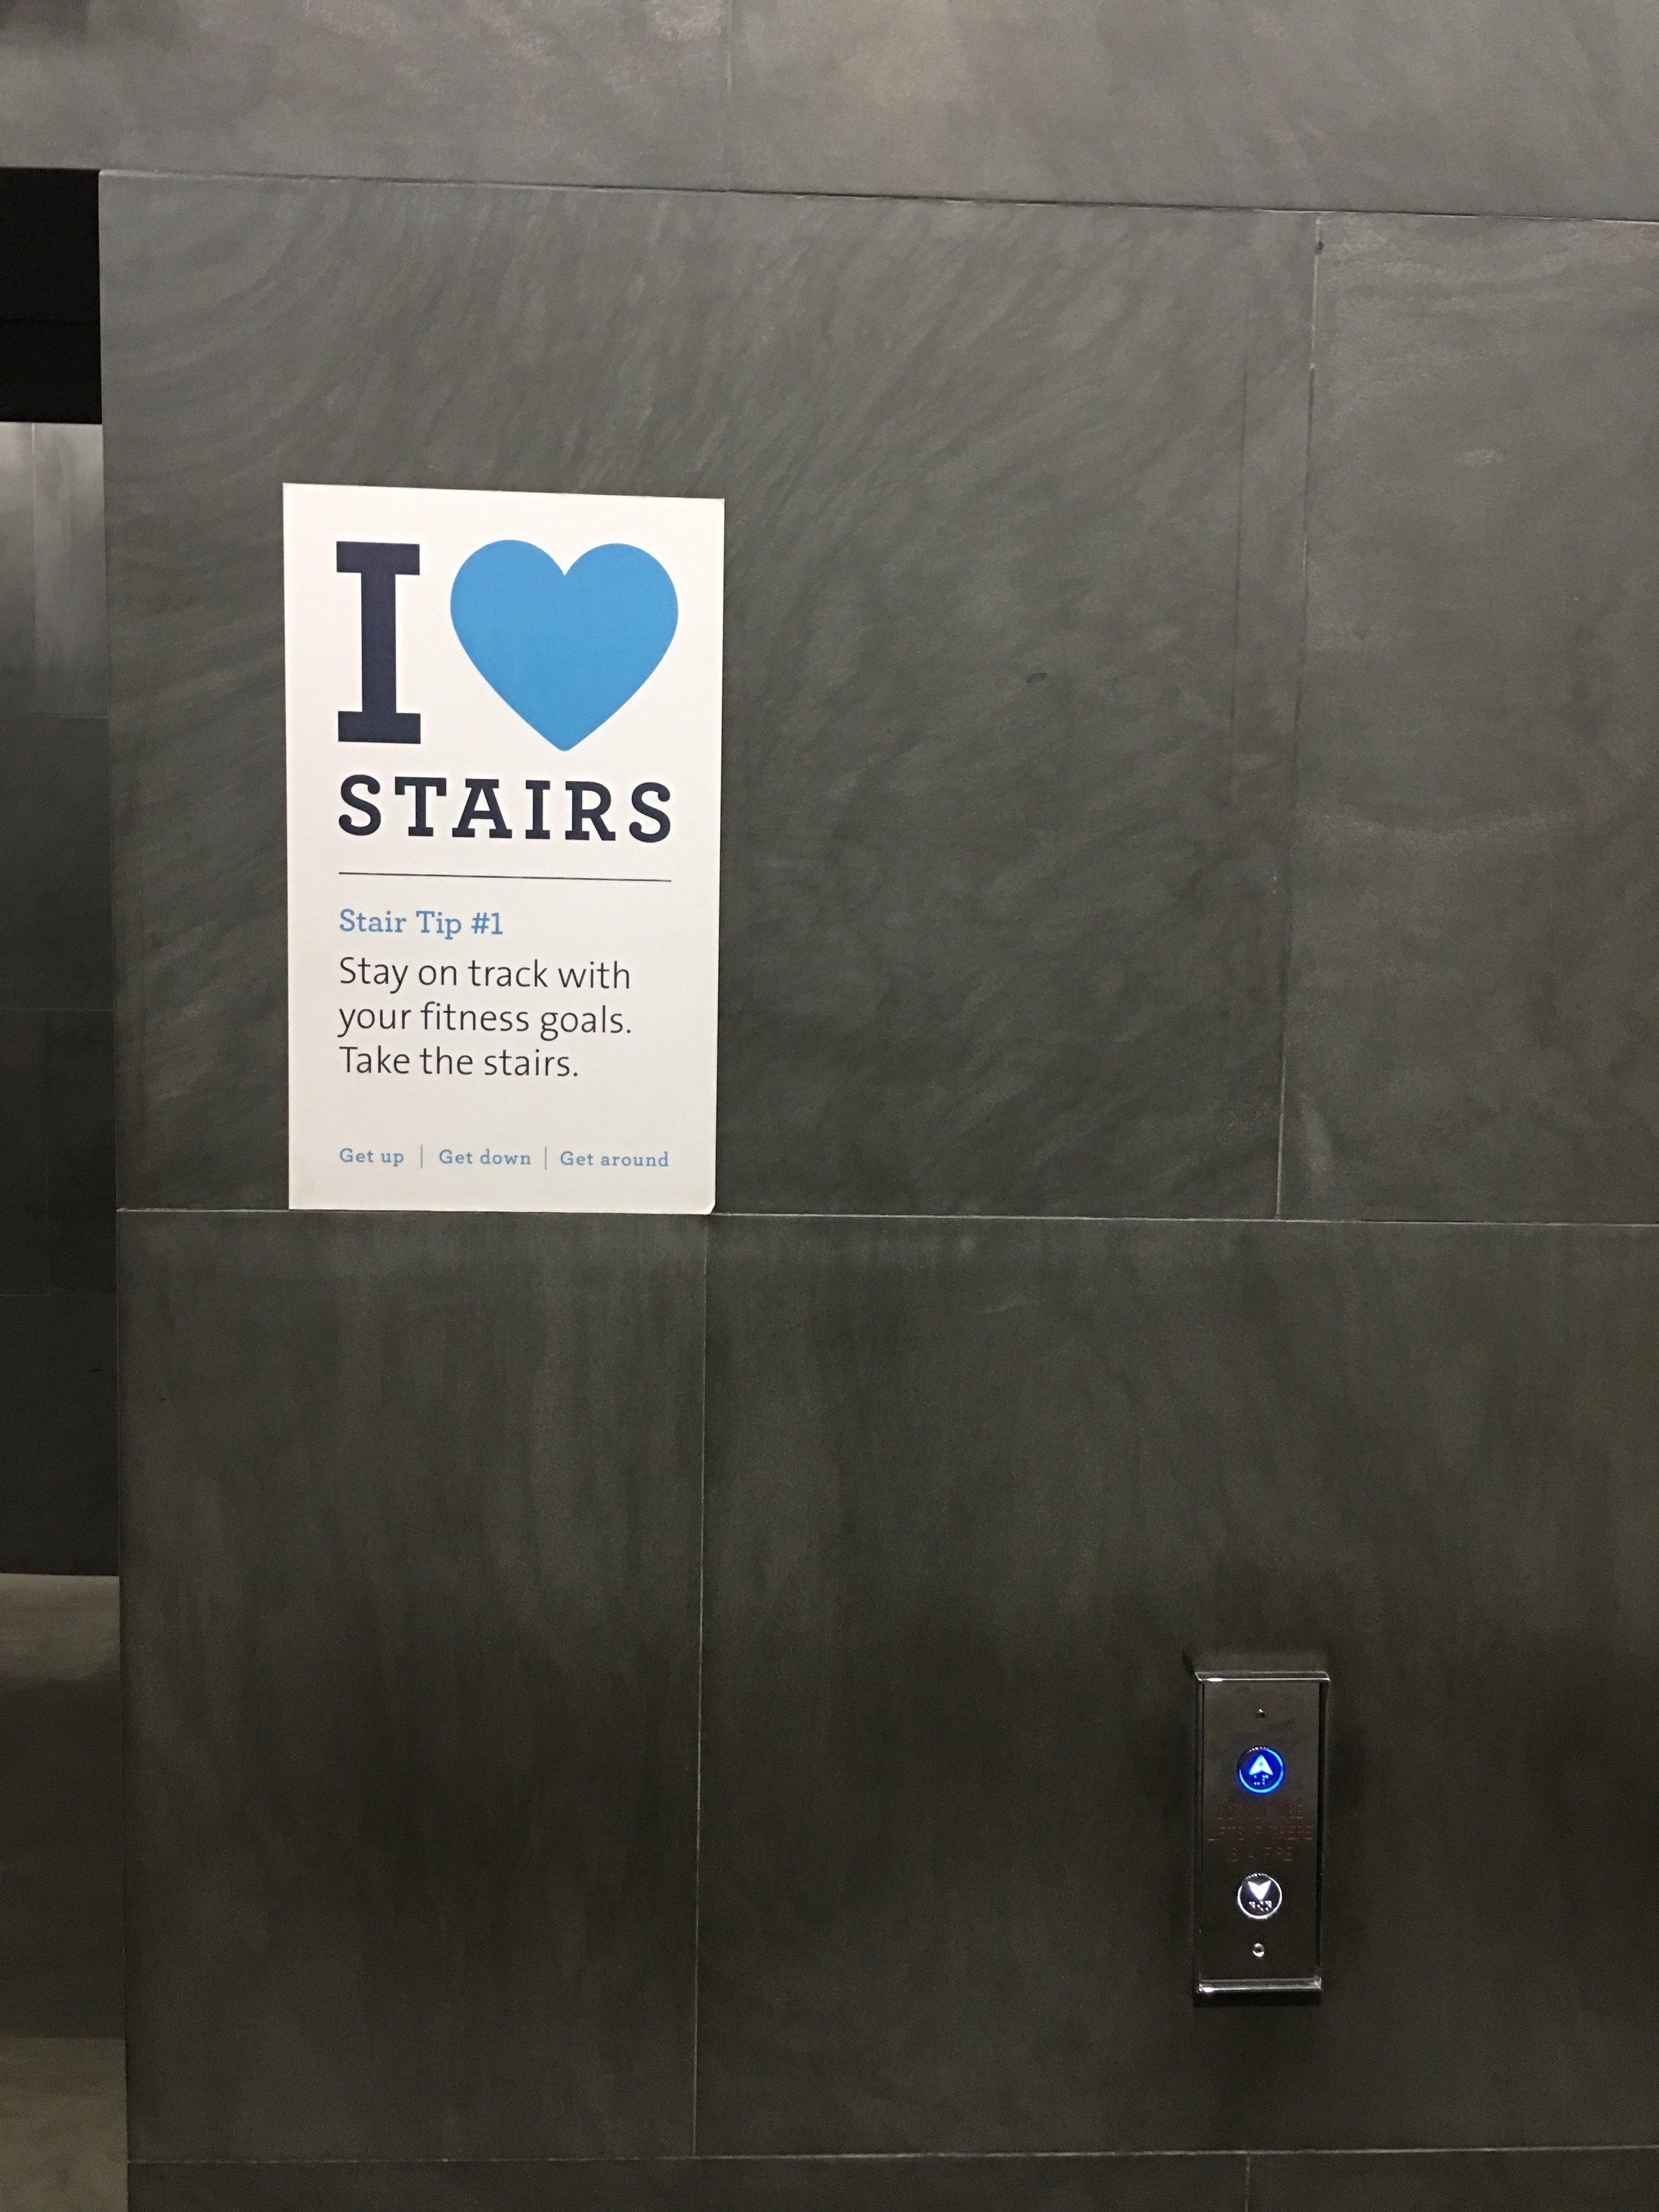 Elevator_Poster_By_Christopher_Roosen_2019.jpg